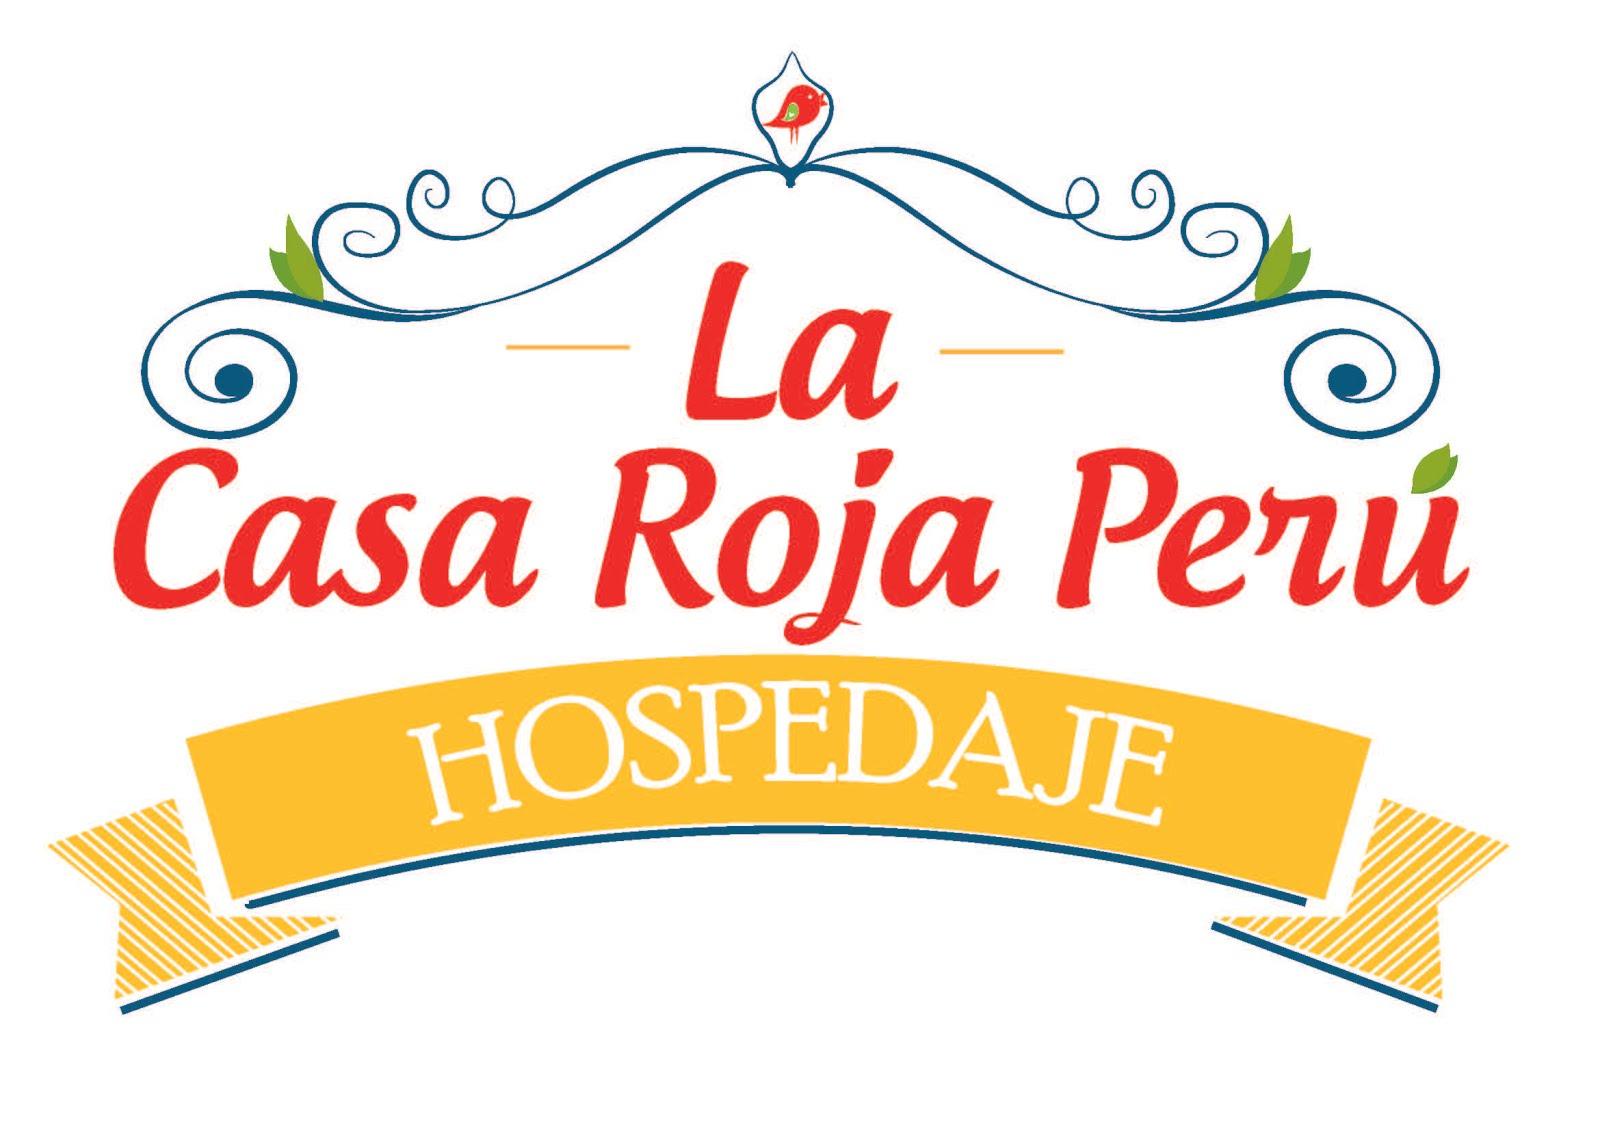 LA CASA ROJA PERU